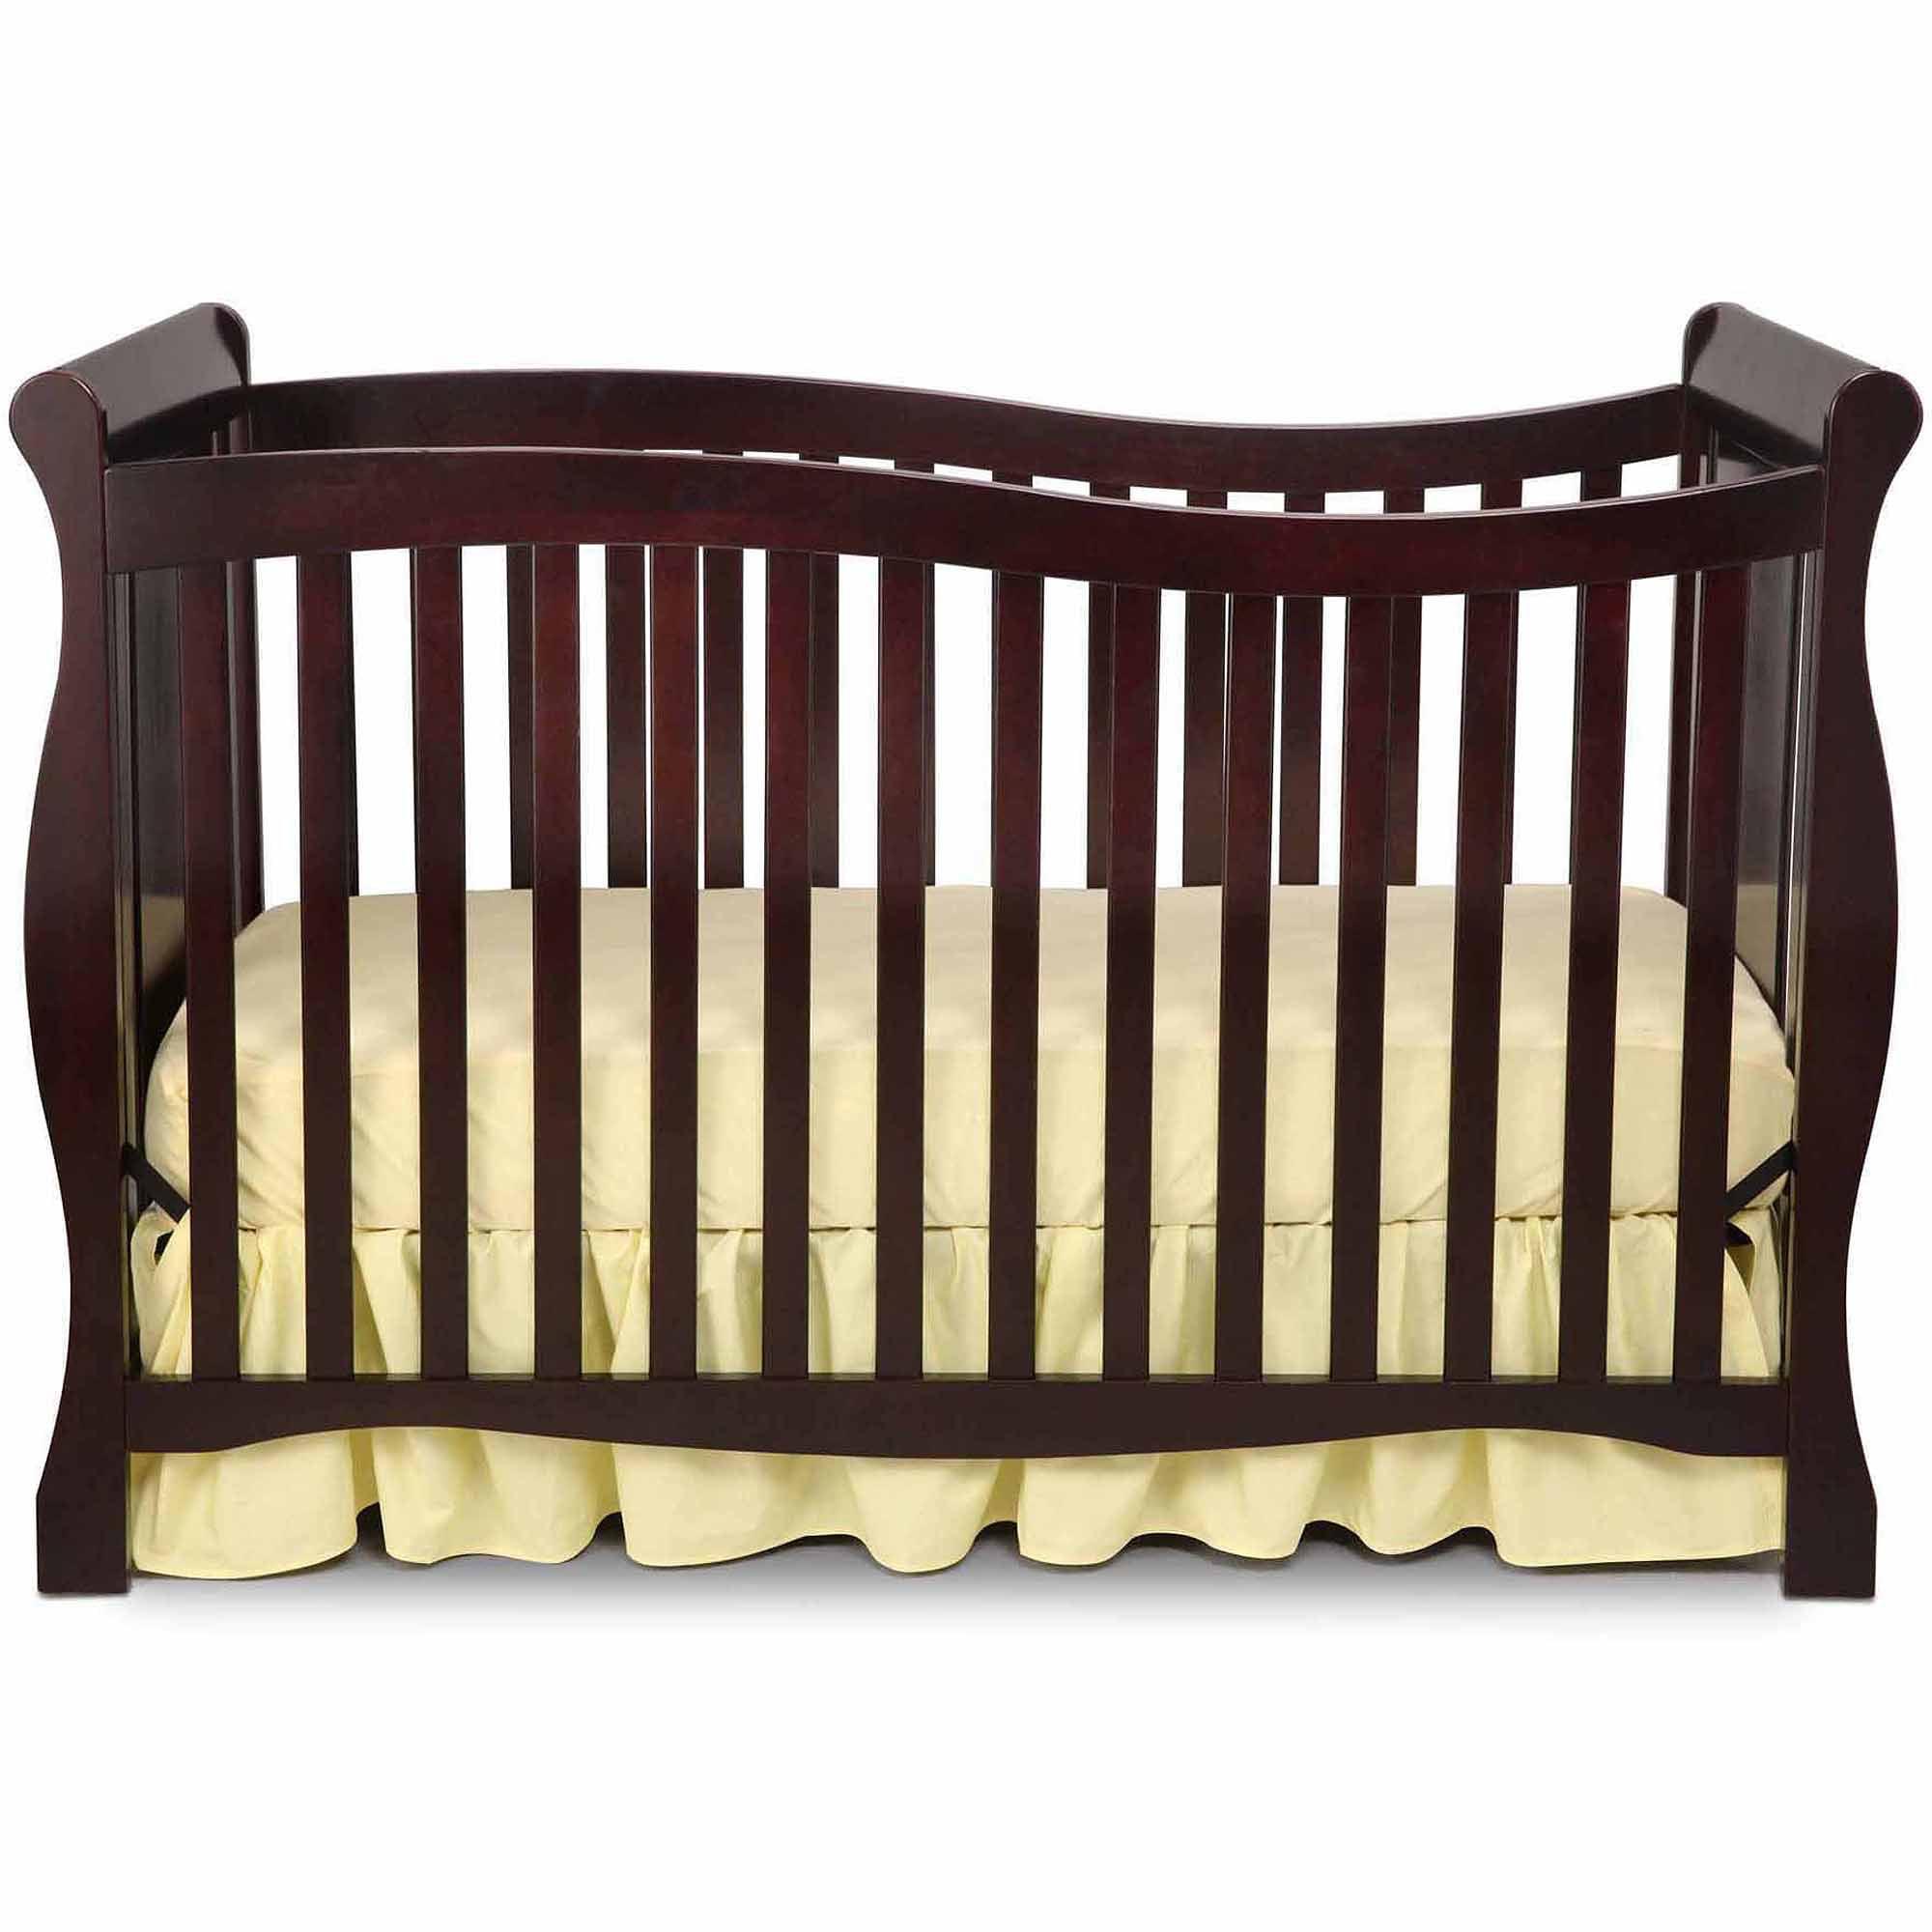 Ellis crib instructions for Child craft convertible crib instructions